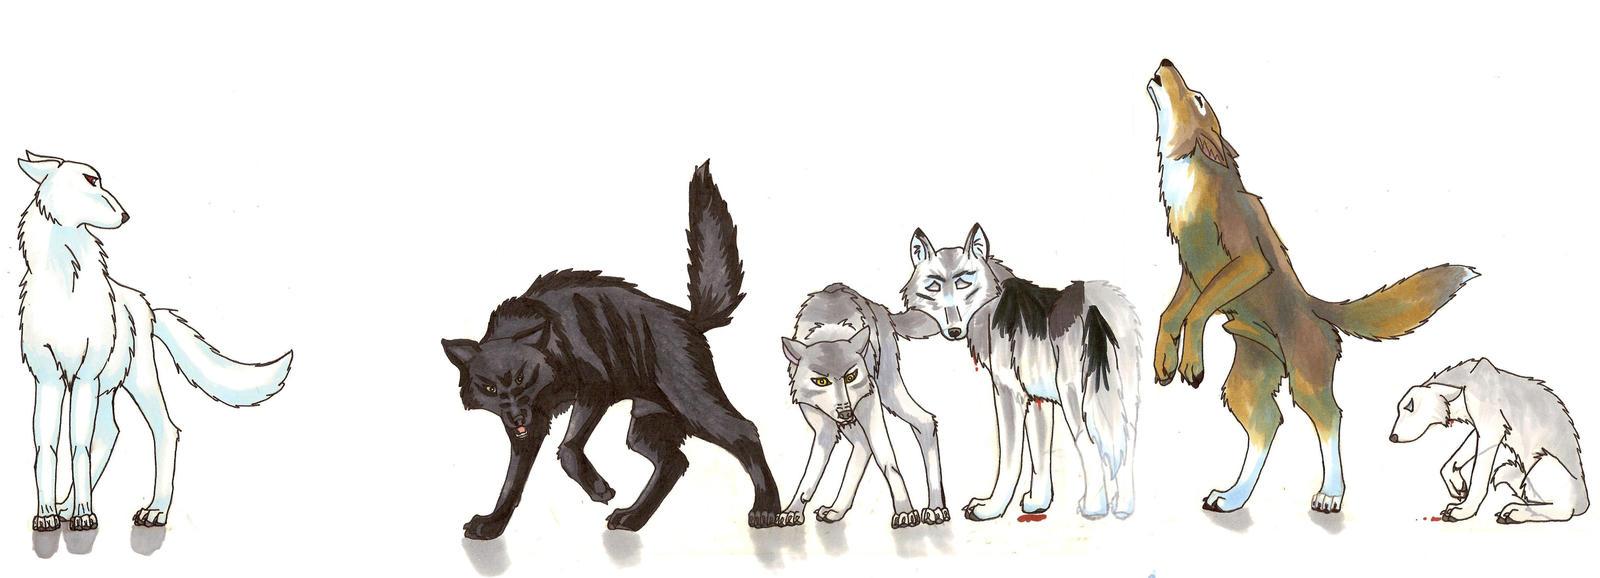 Stark Direwolves by Circecat1 on DeviantArt